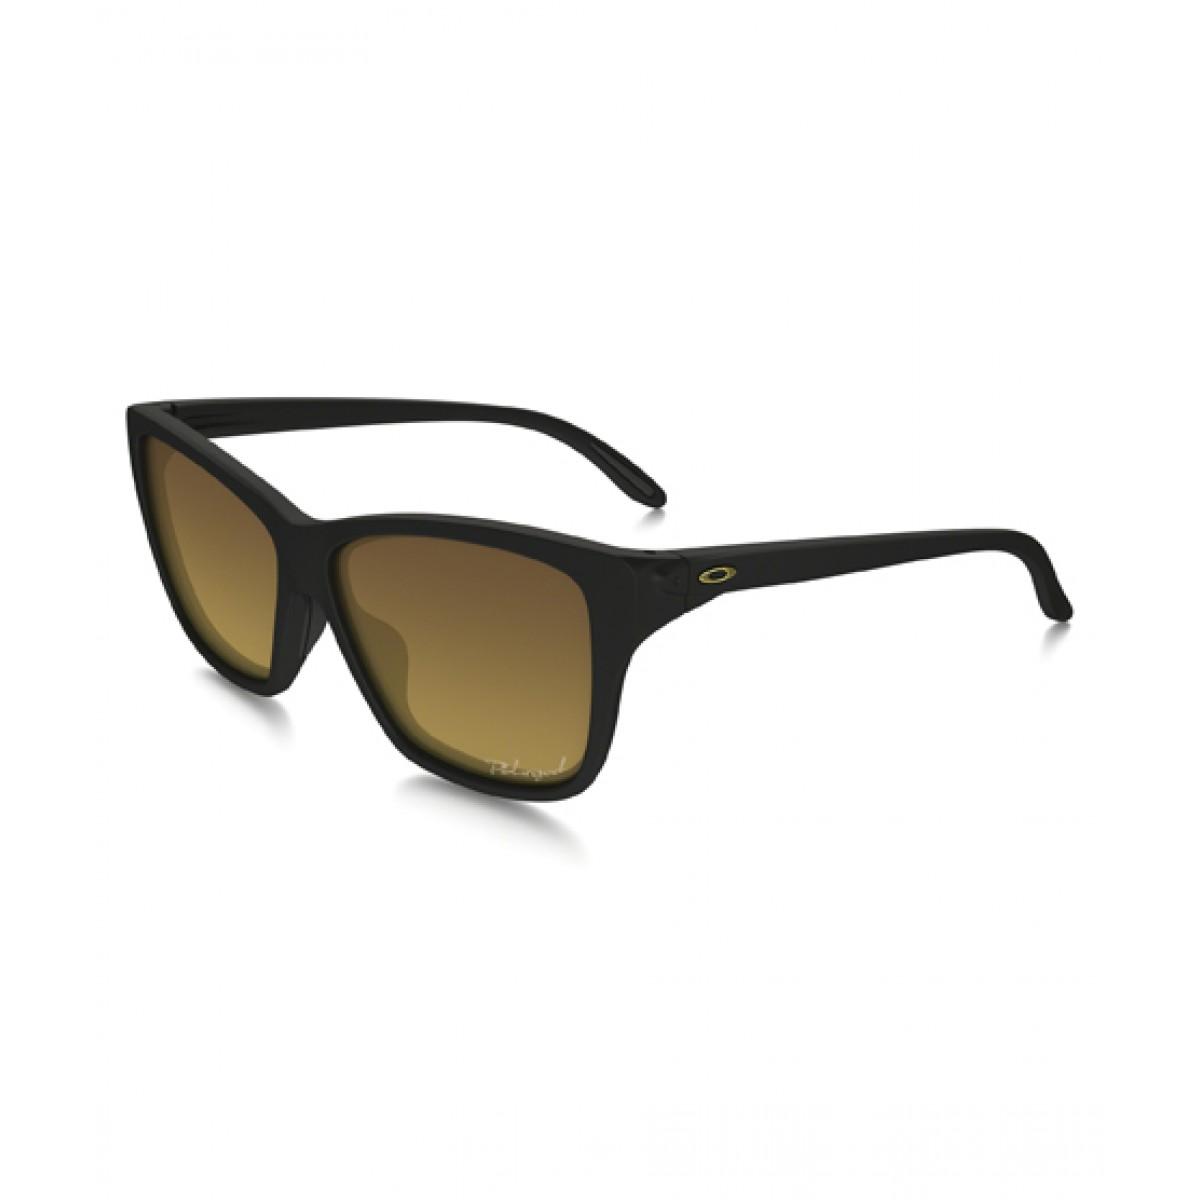 Oakley Women Polarized Hold On Sunglasses (9298-06)